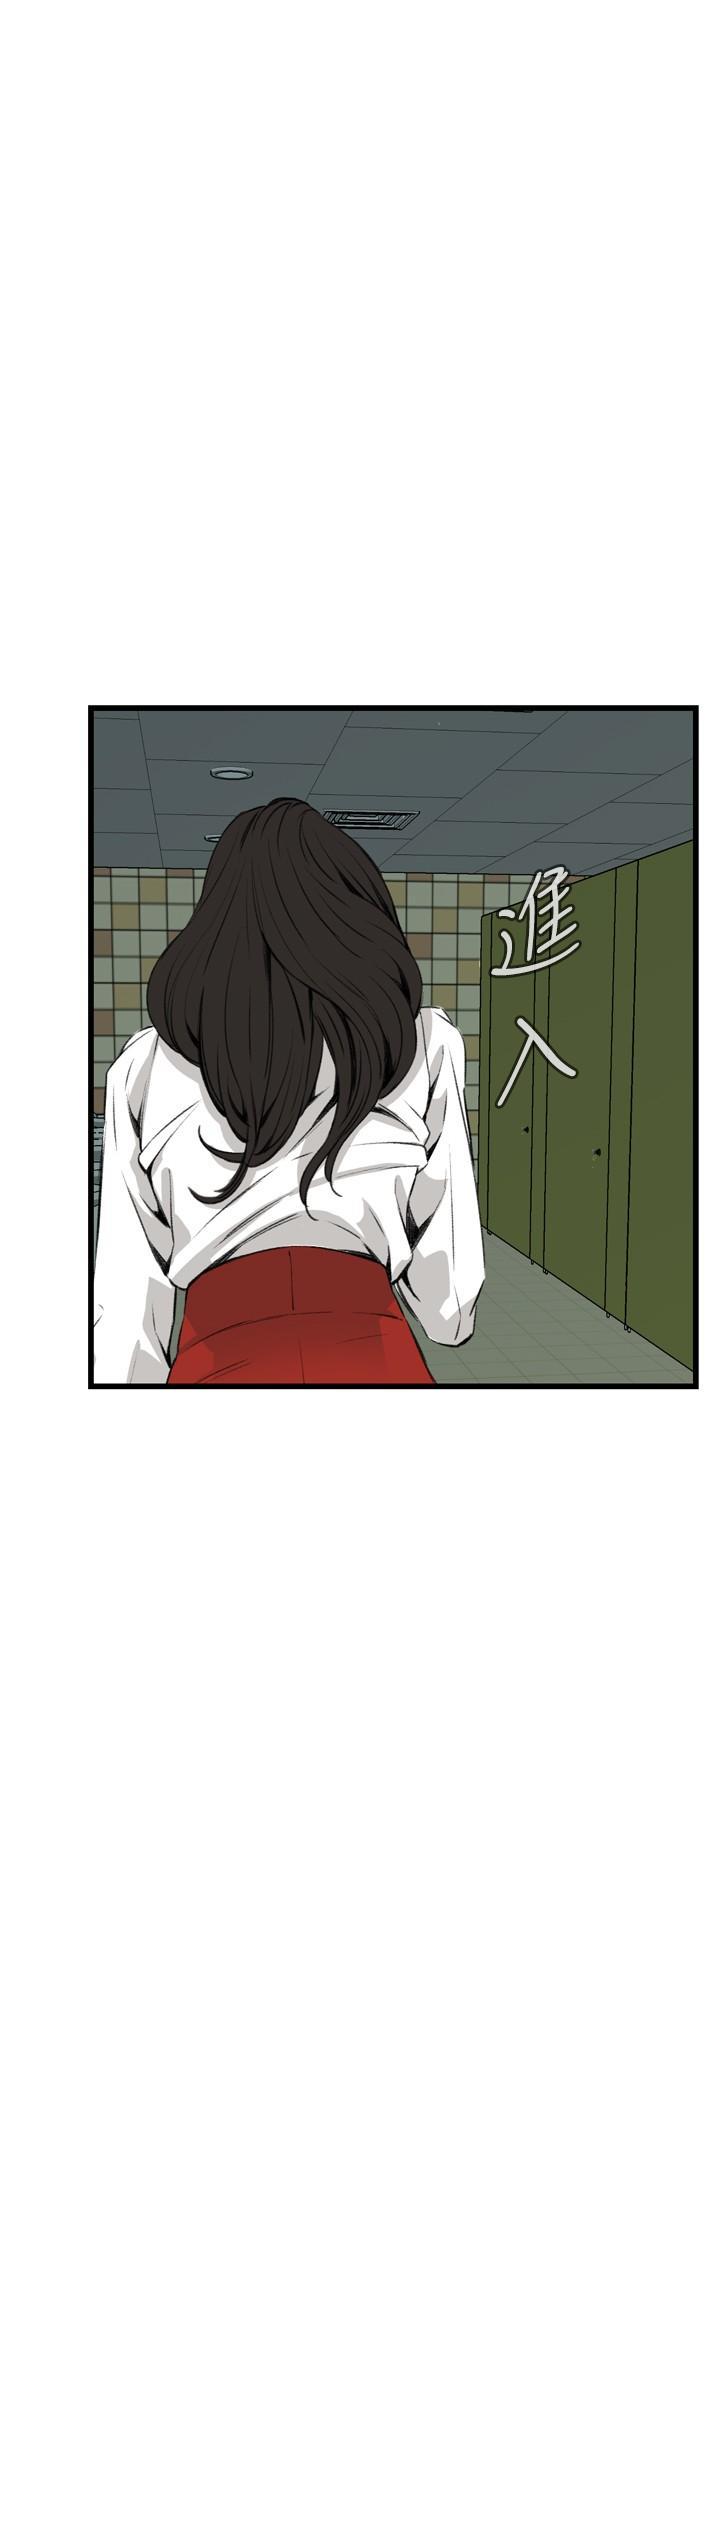 Take a Peek 偷窥 Ch.39~51 [Chinese]中文 361